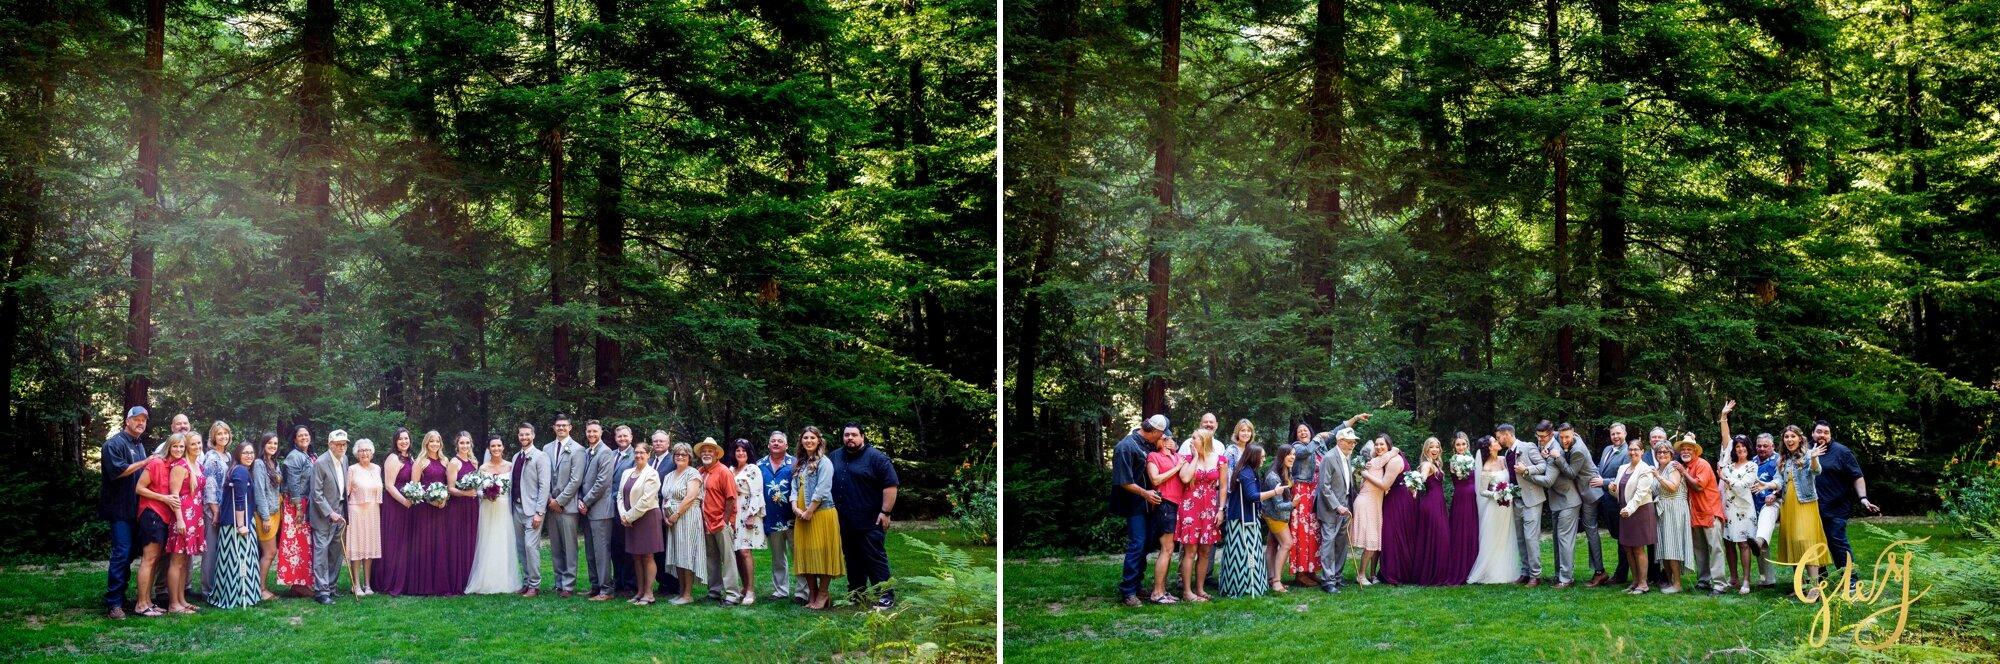 Casey + Jordan's Intimate Big Sur Elopement in the Redwoods by Glass Woods Media 49.jpg